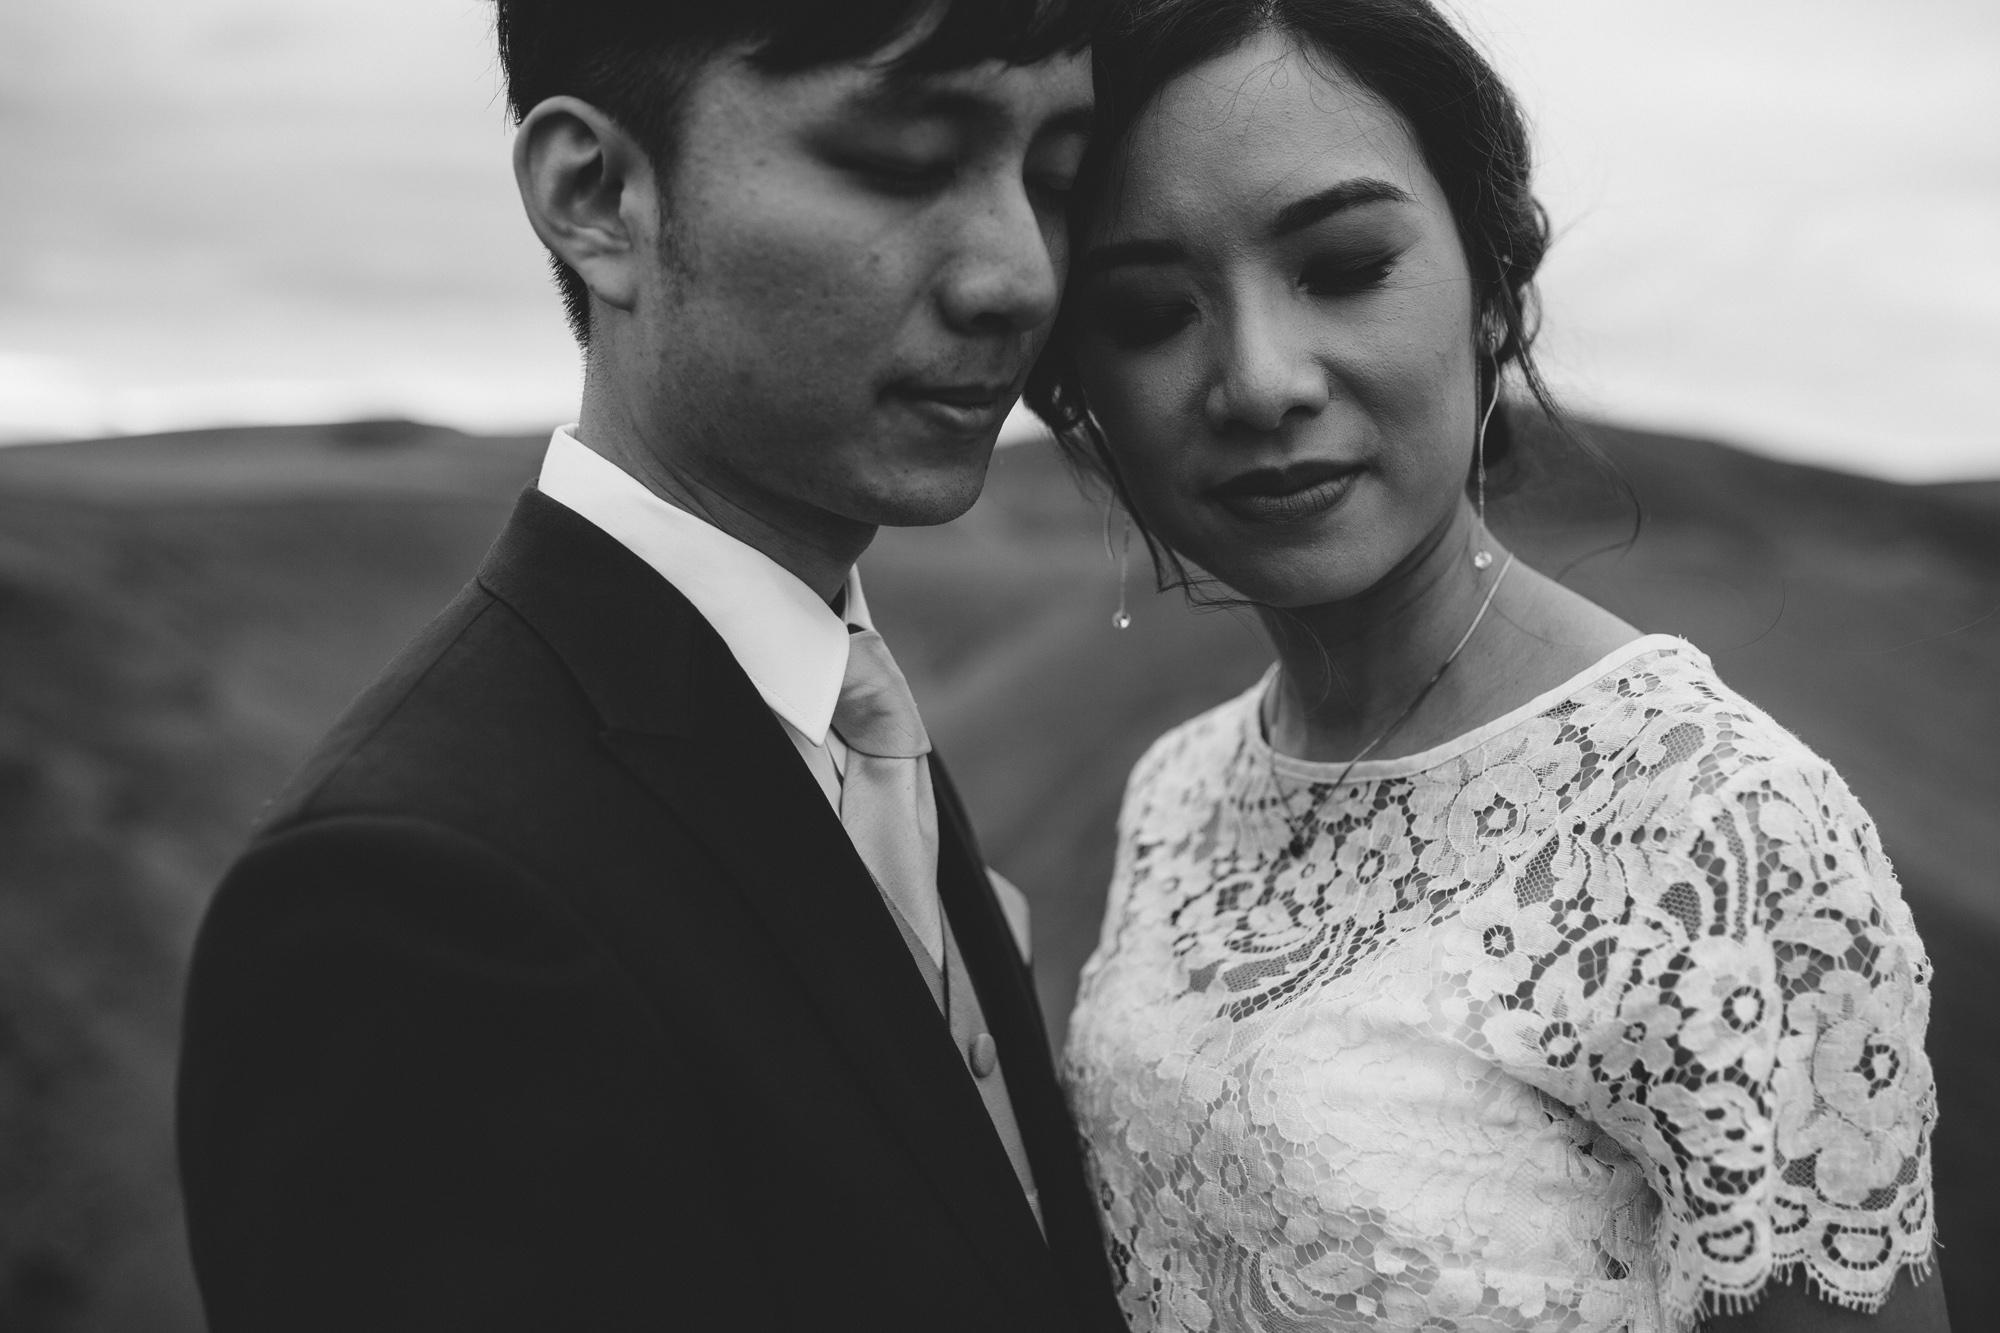 Kate-Beaumont-Wedding-Dress-Bridal-Separates-Peak-District-Shoot-8.jpg